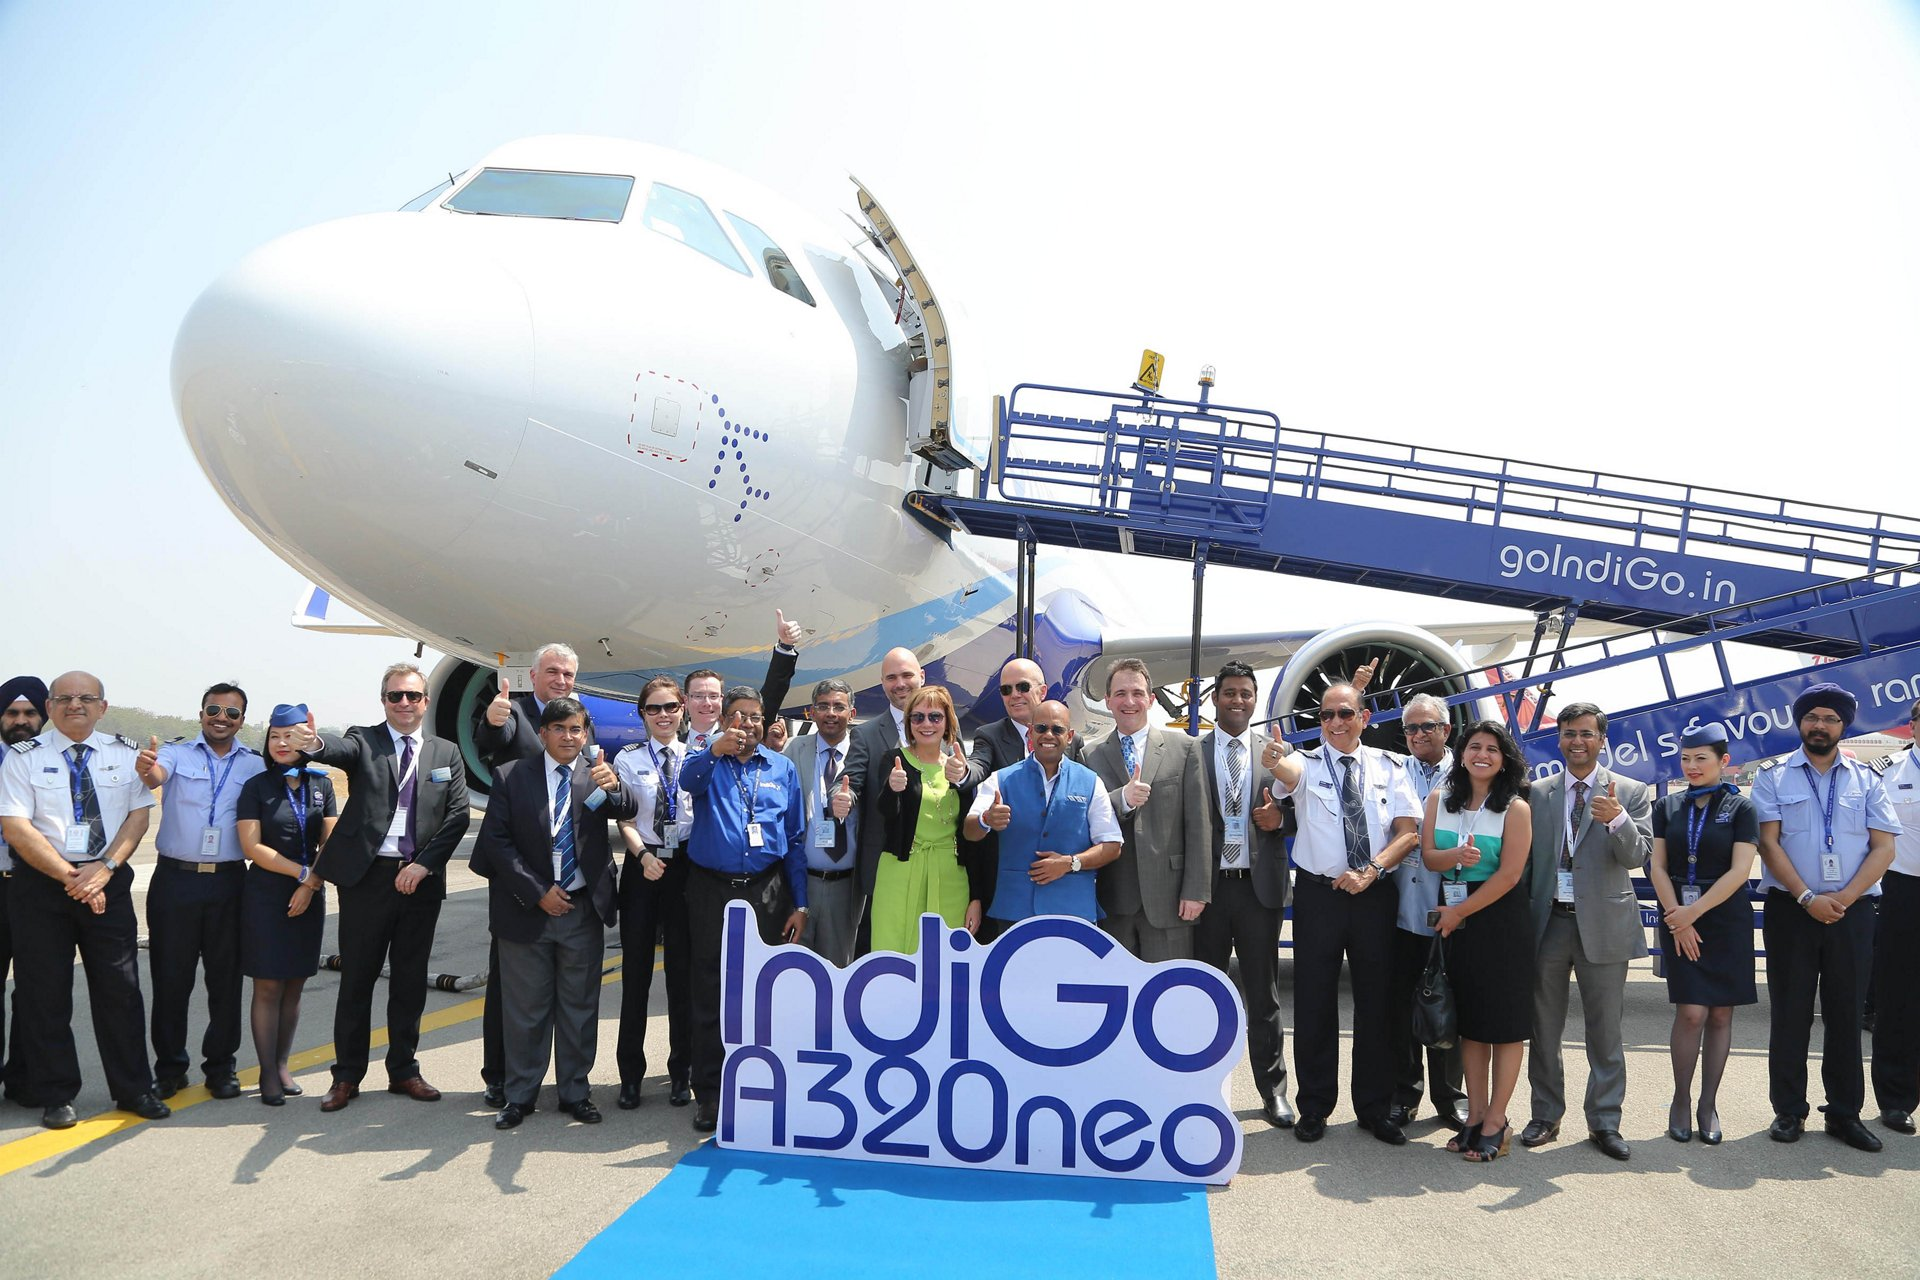 IndiGo A320neo appearance at India Aviation_1